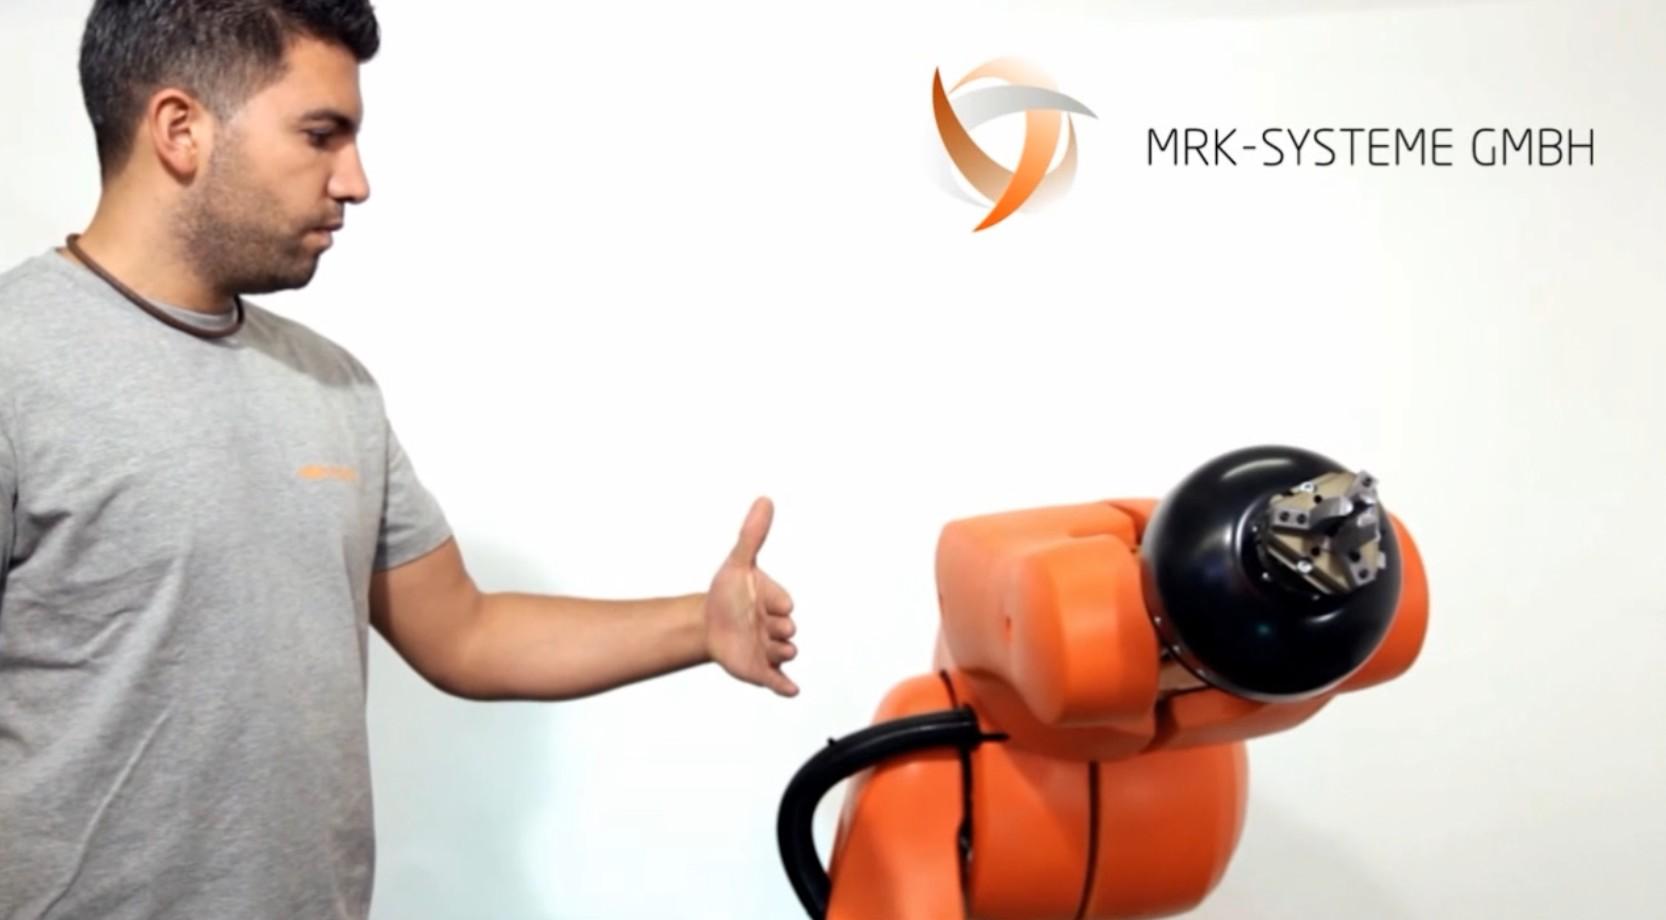 collaborative-robots-KUKA-KR5 SI-sensors